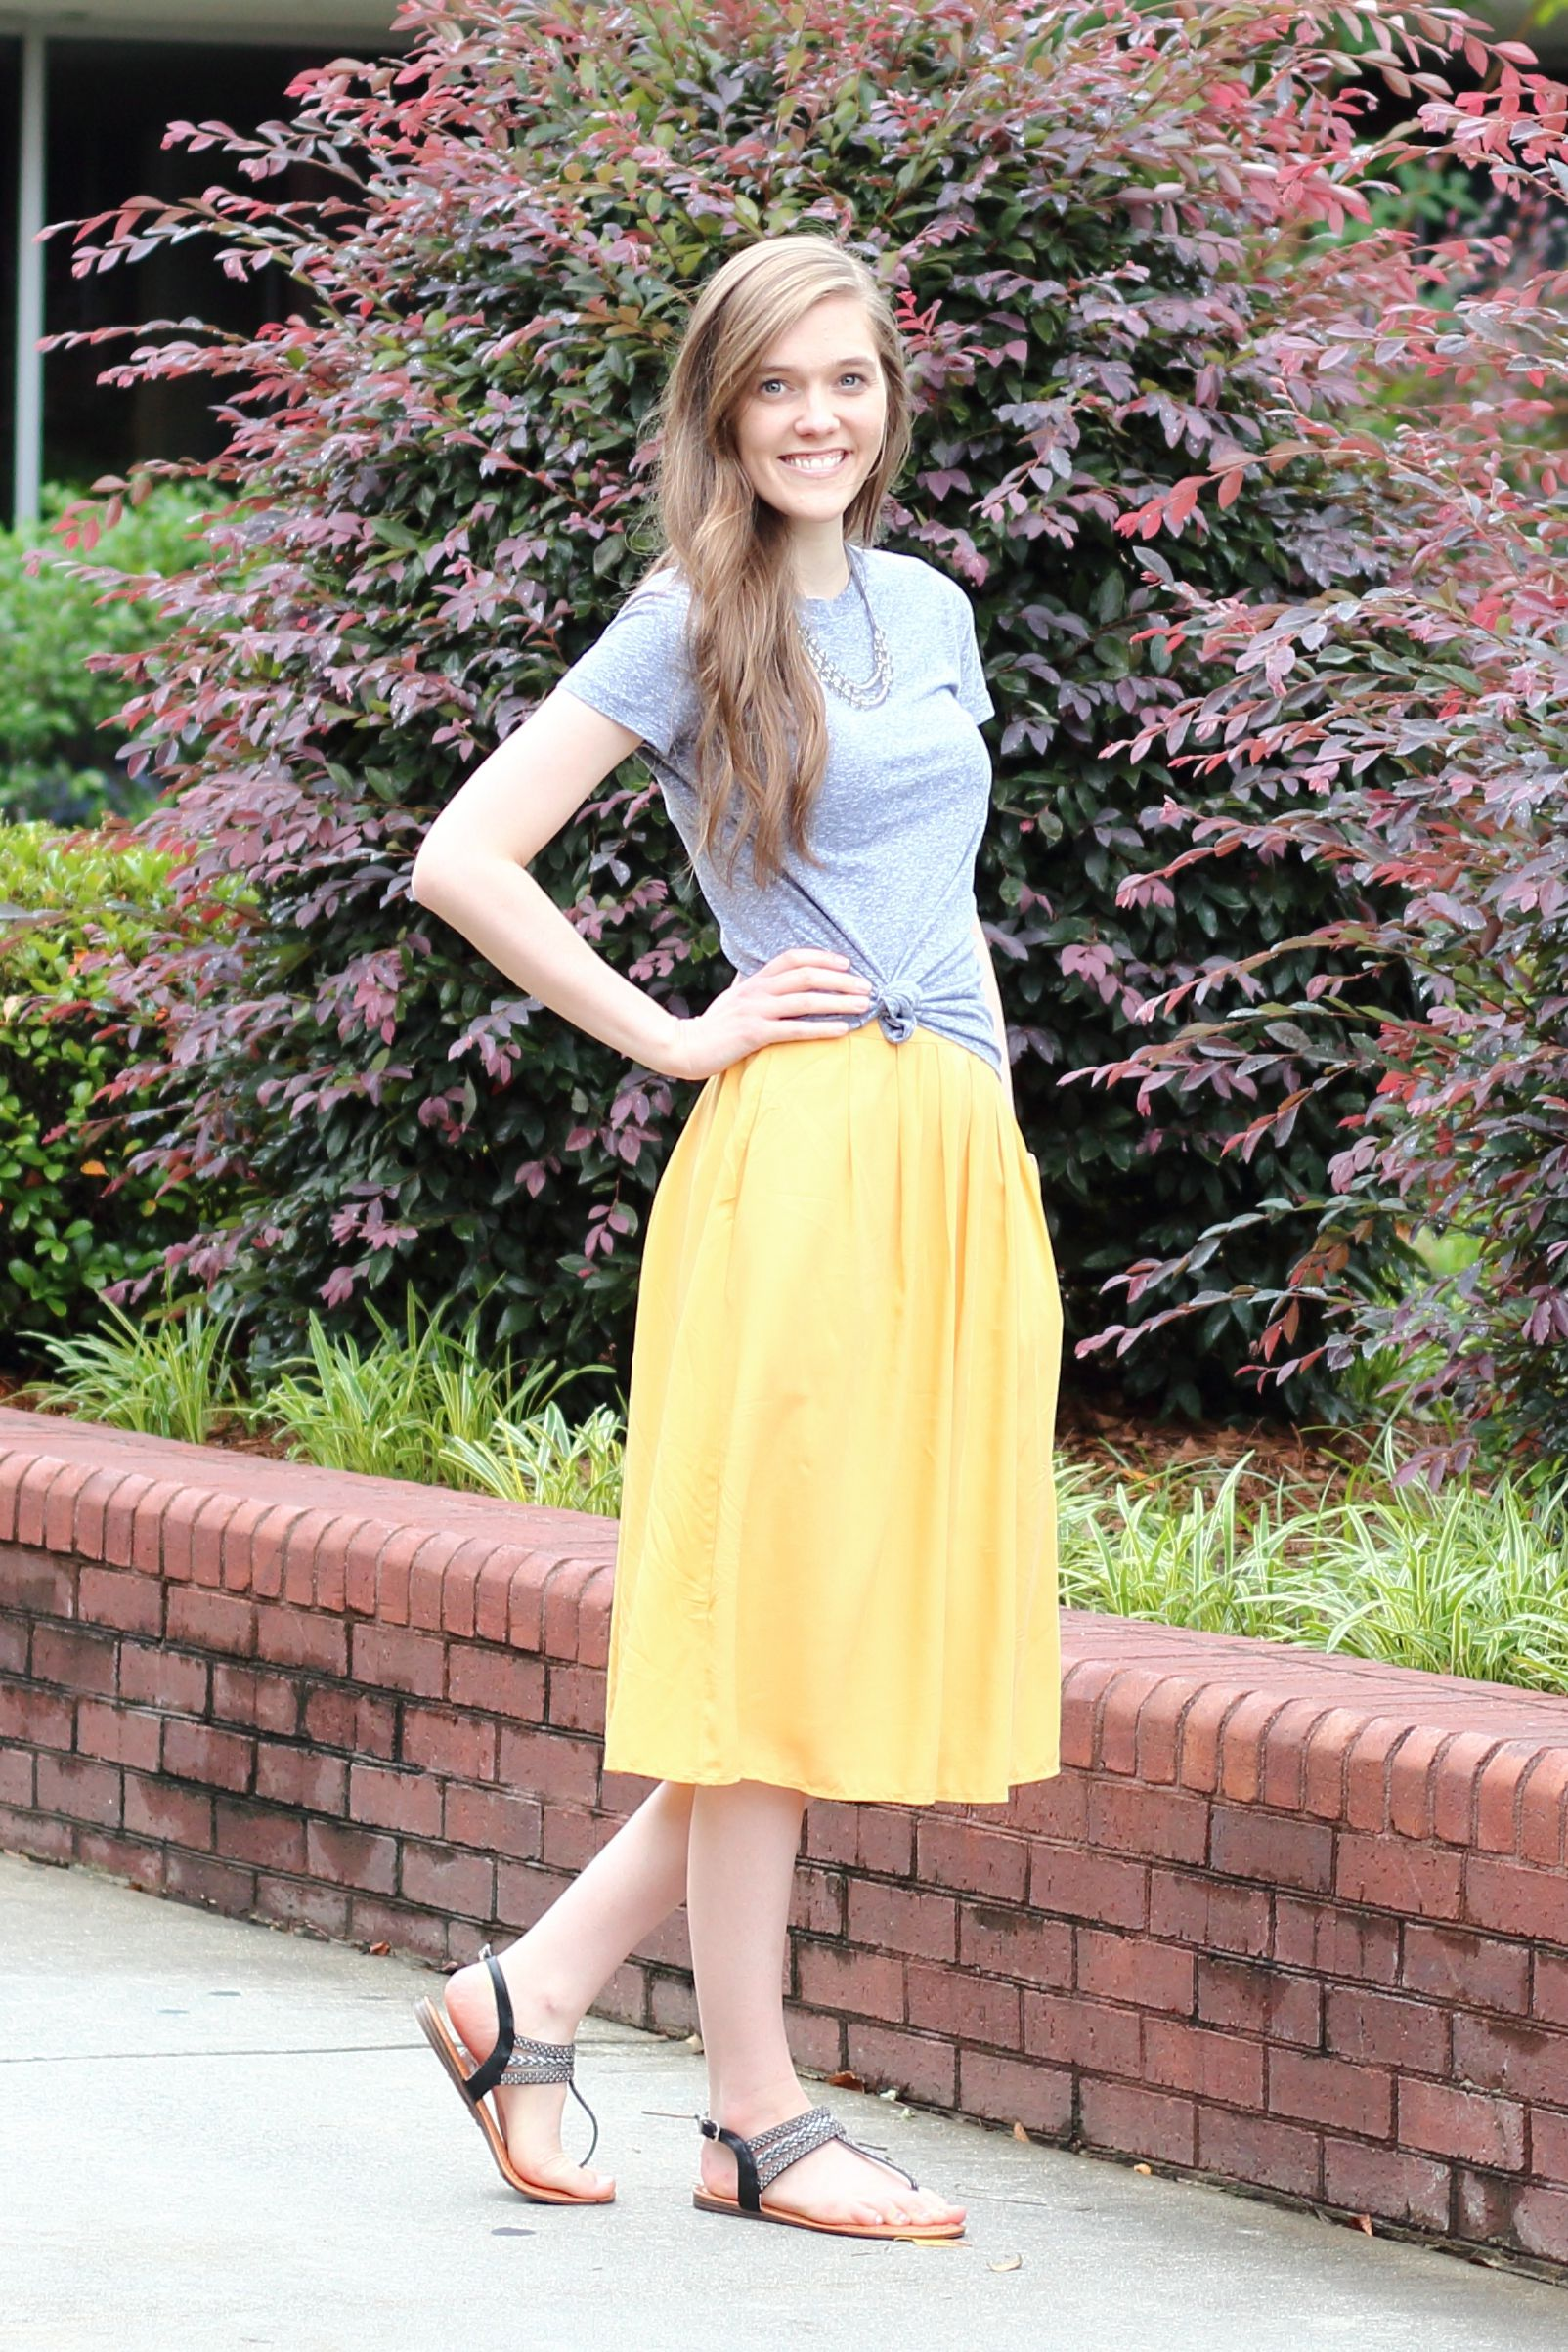 Modest casual outfit idea for churchyellow midi skirt